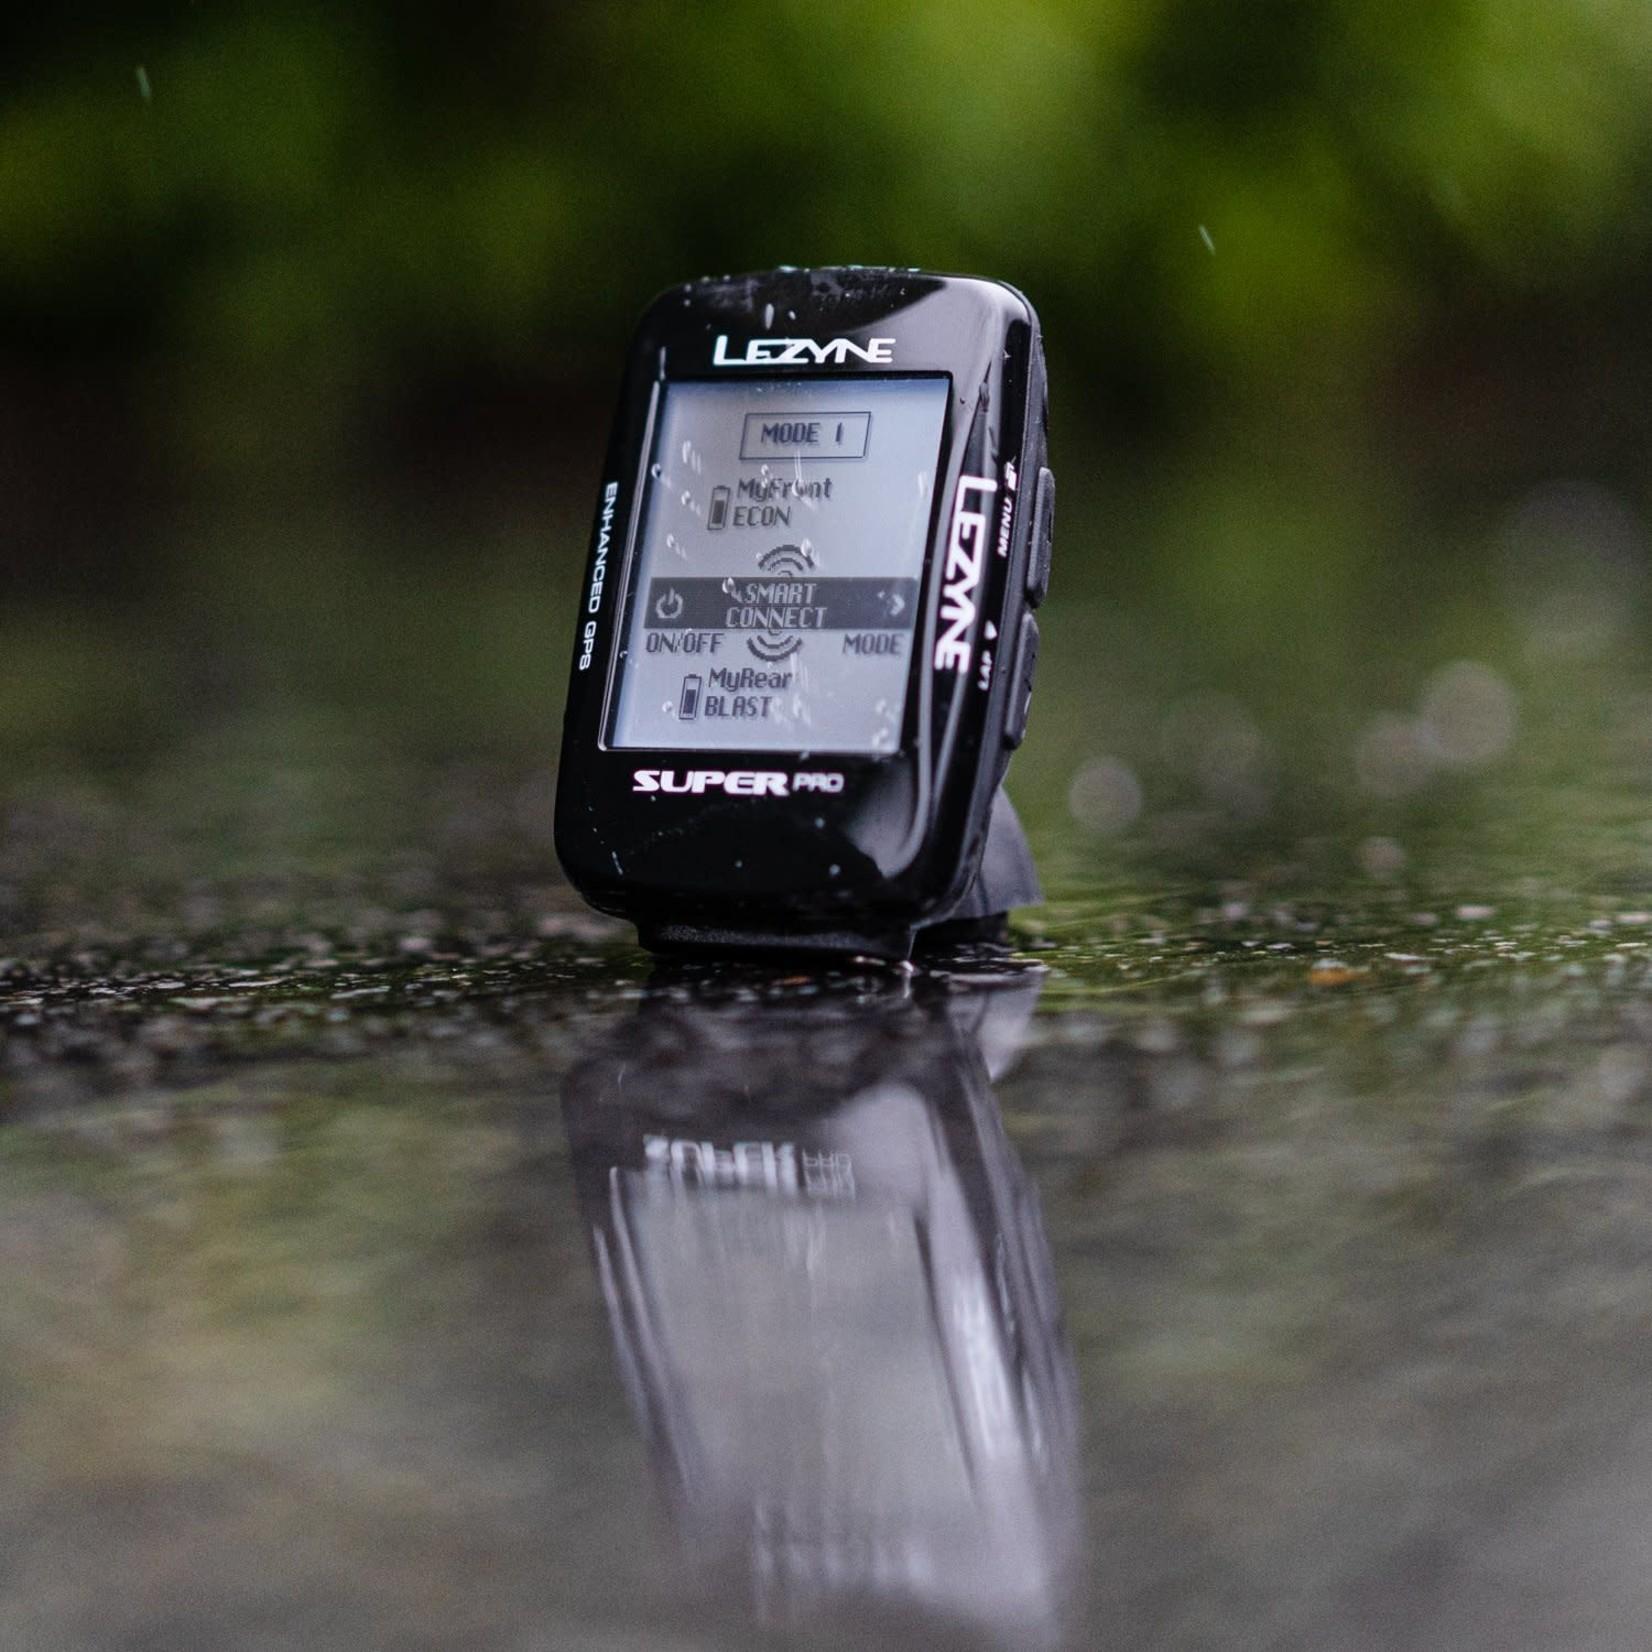 Lezyne Lezyne Super Pro GPS HR Computer with Cadence